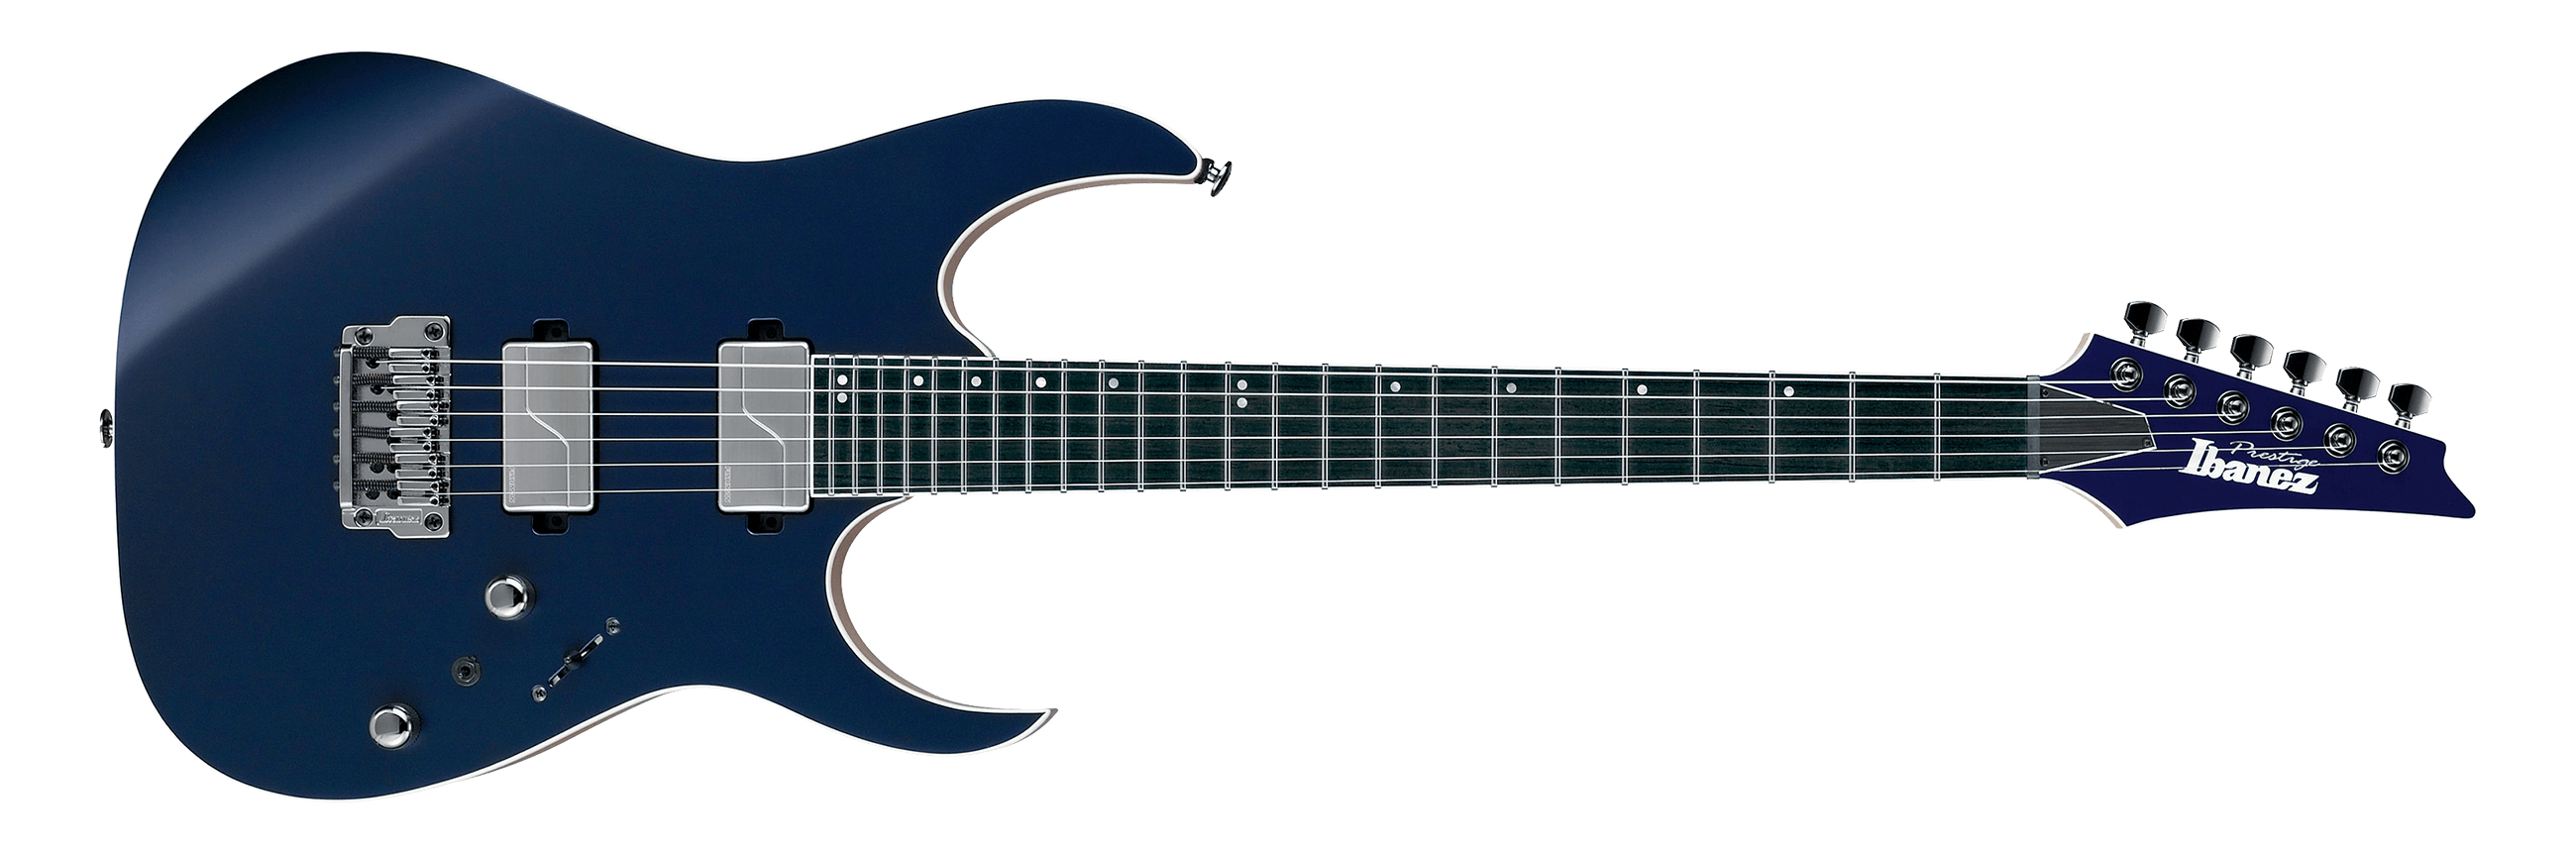 RG5121-DBF